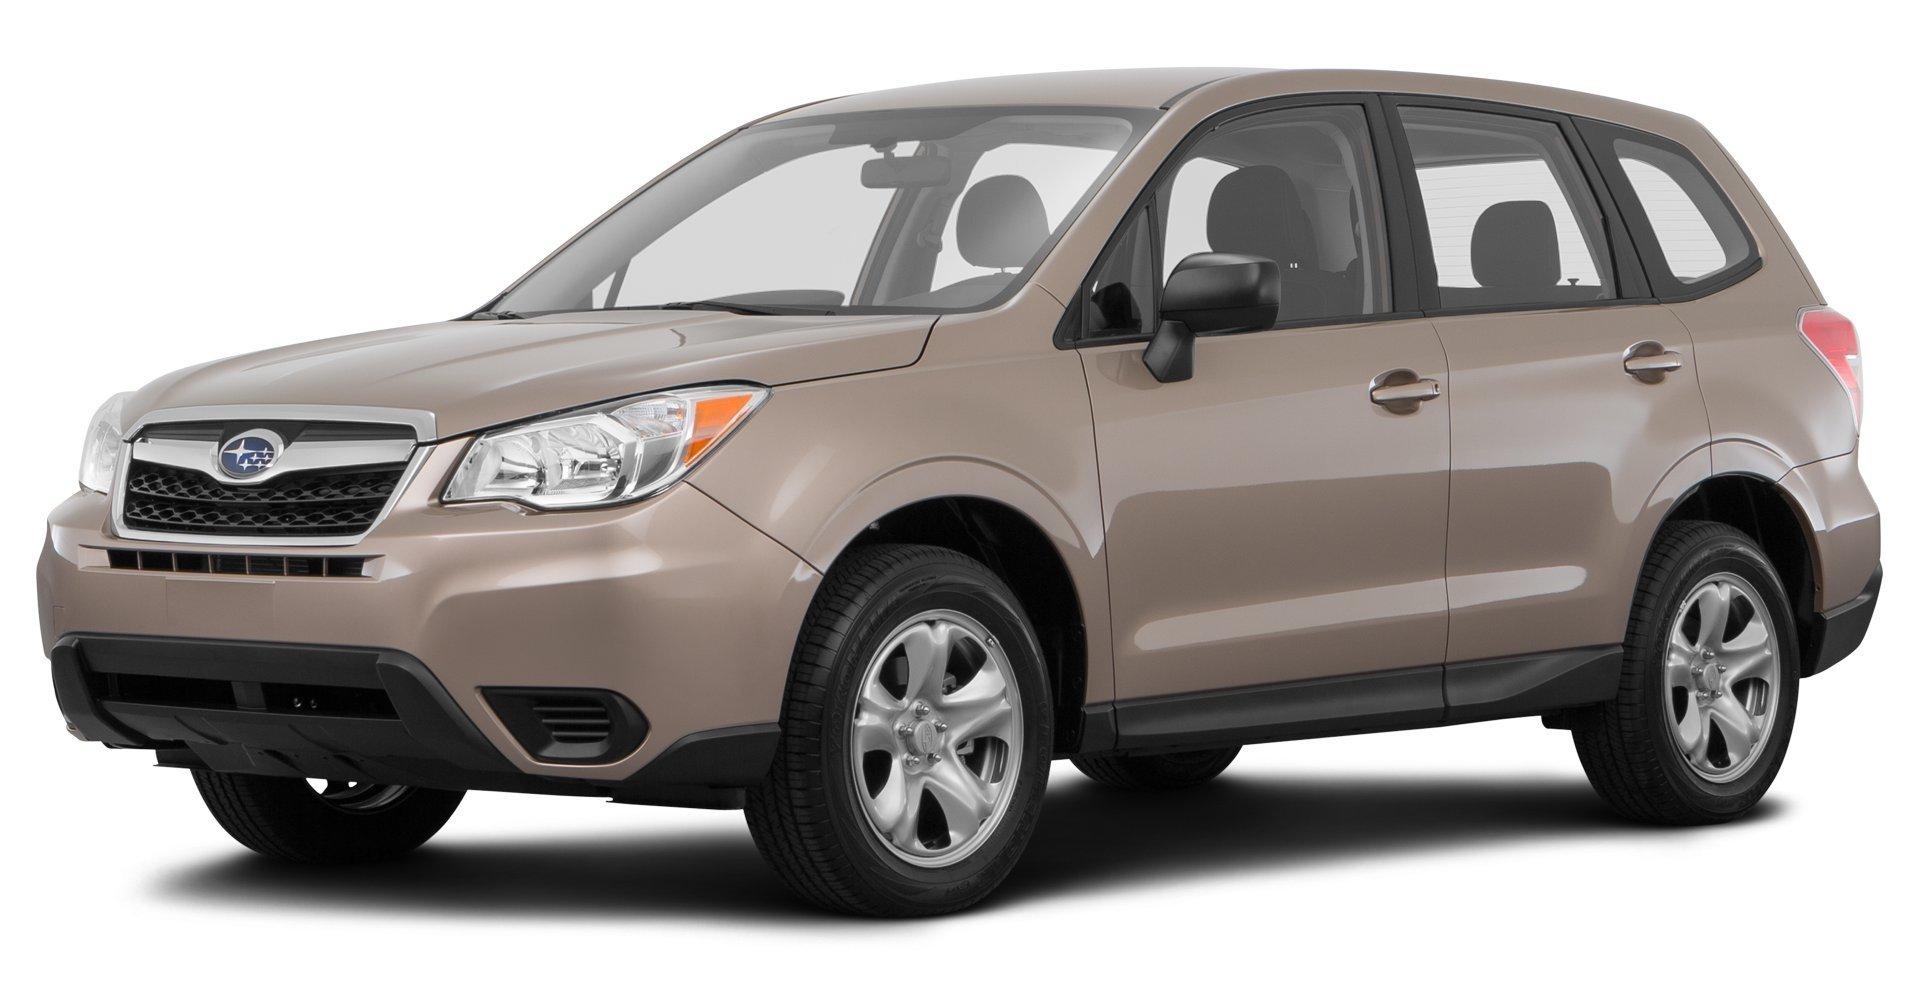 Amazon 2016 Subaru Crosstrek Reviews and Specs Vehicles